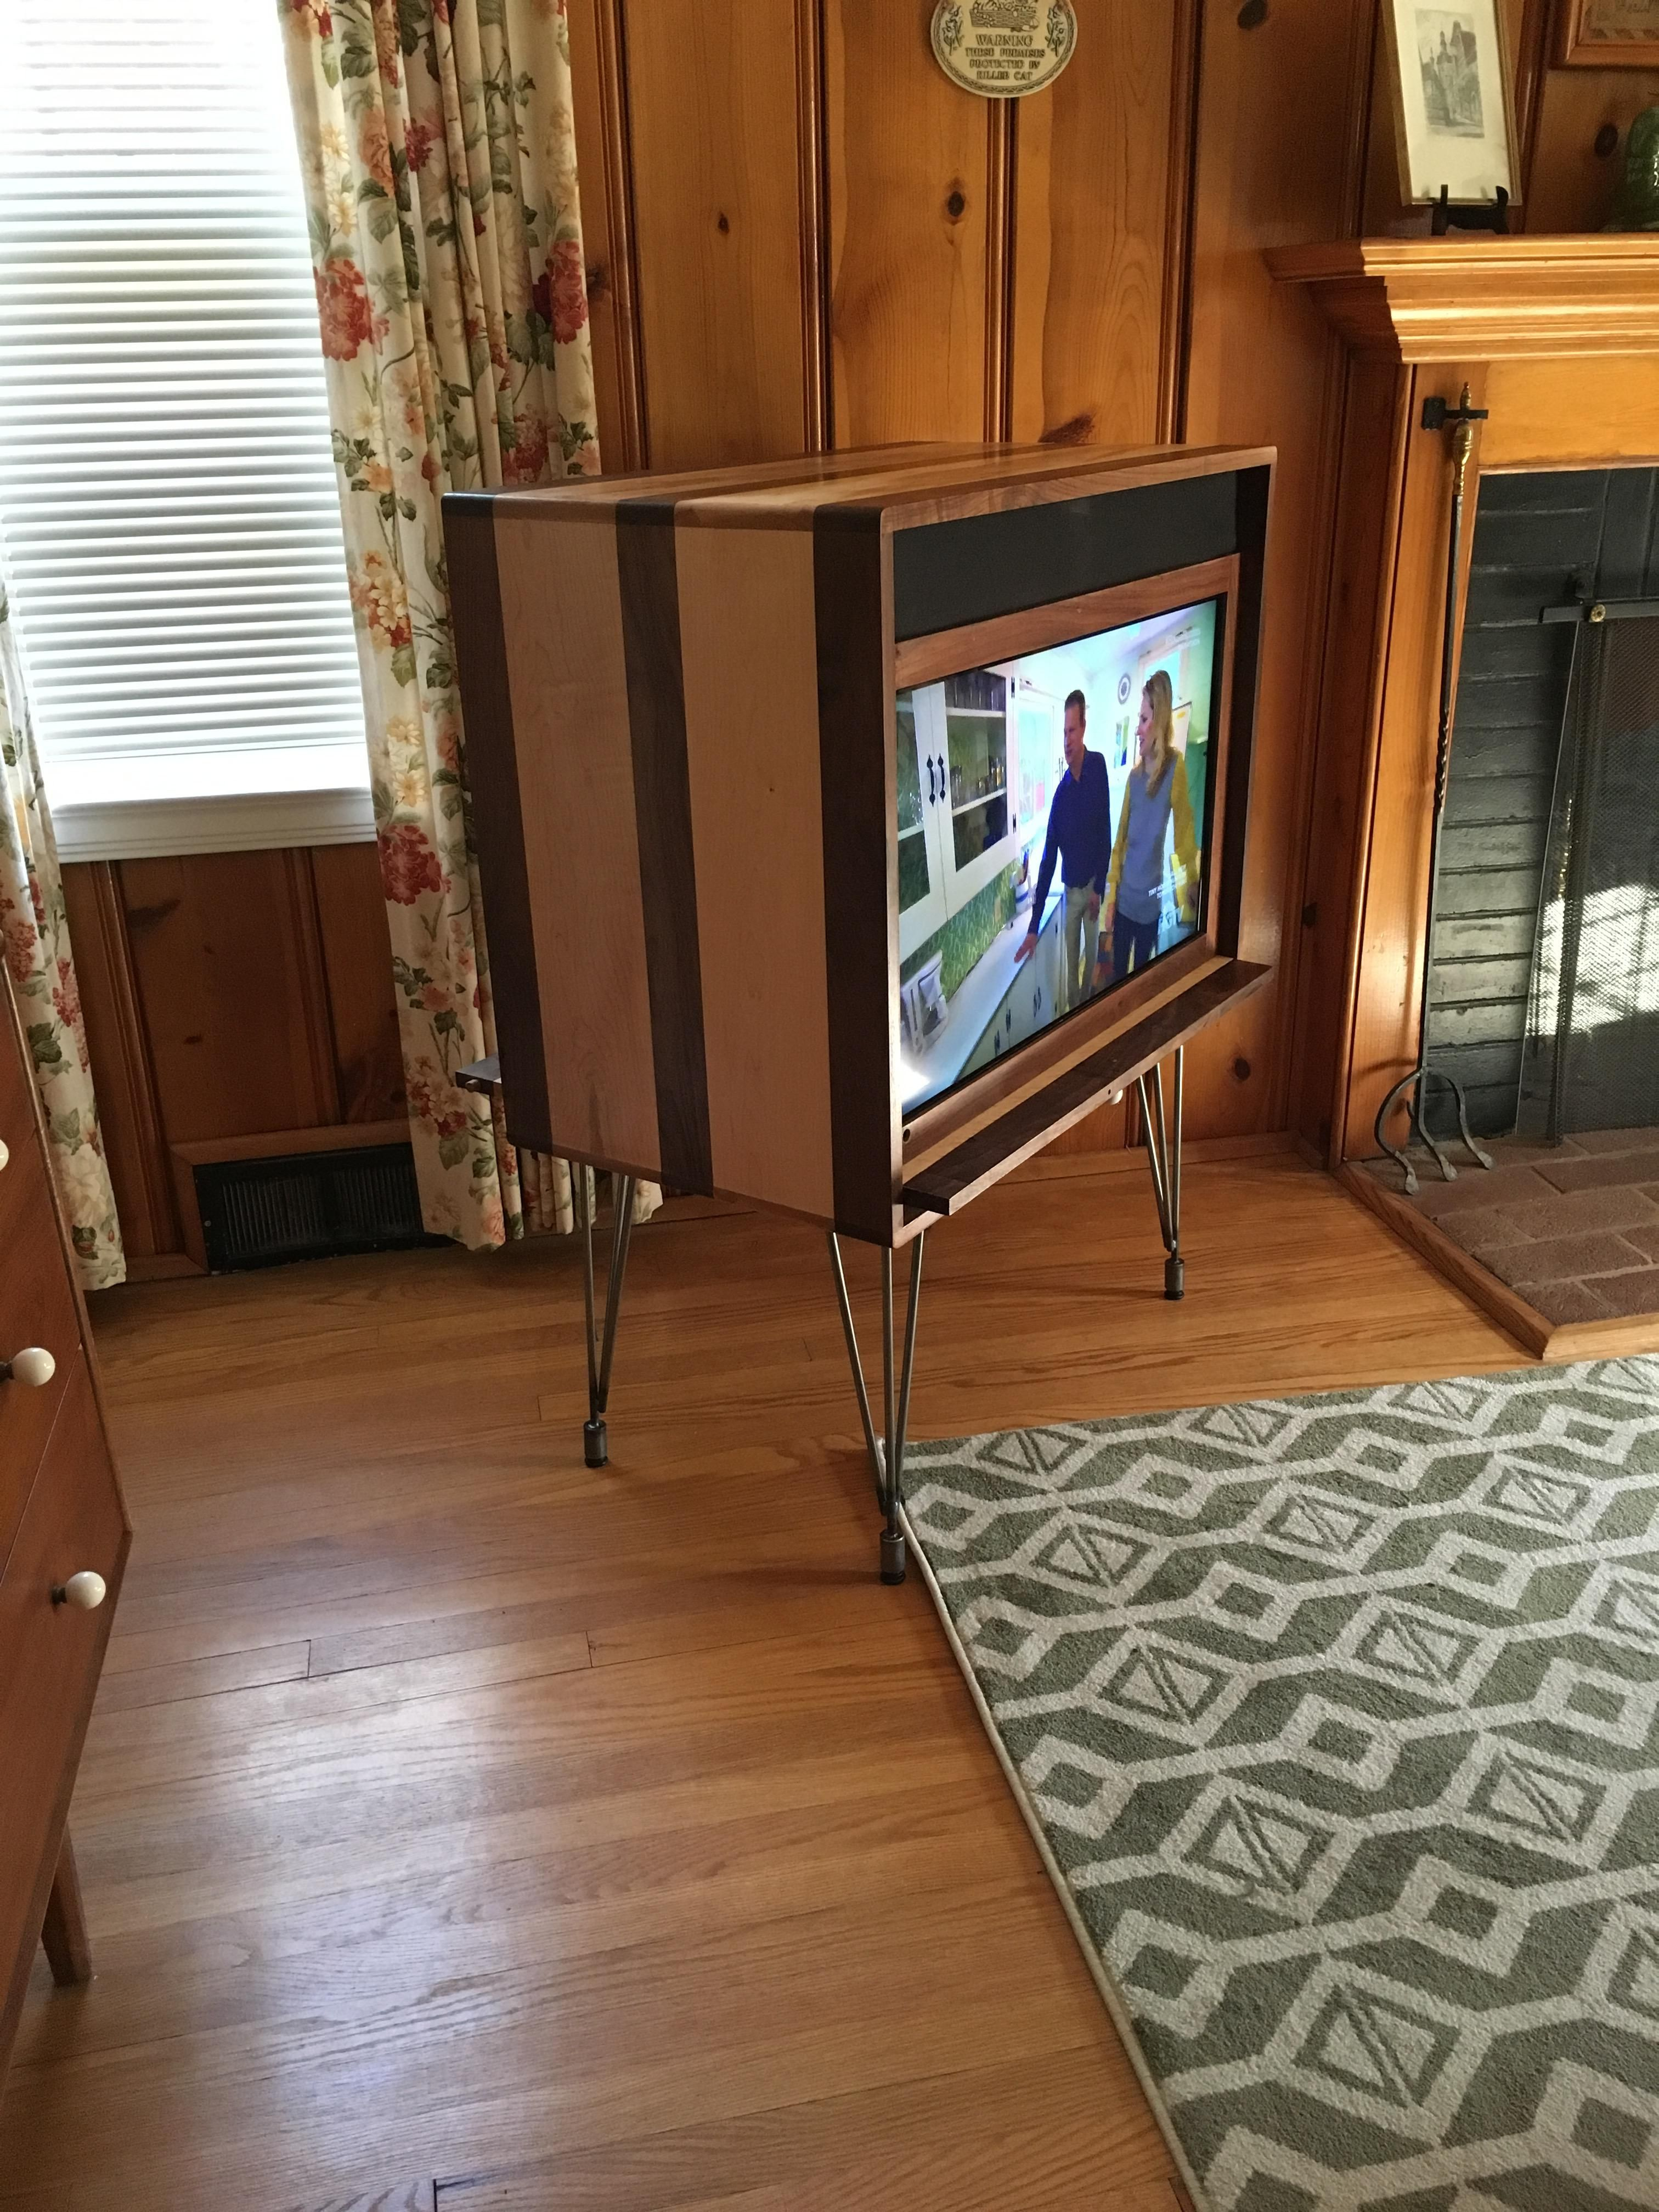 Retro Tv Set Build In 2020 Living Room Tv Living Room Decor Colors Green Living Room Decor #tv #set #for #living #room